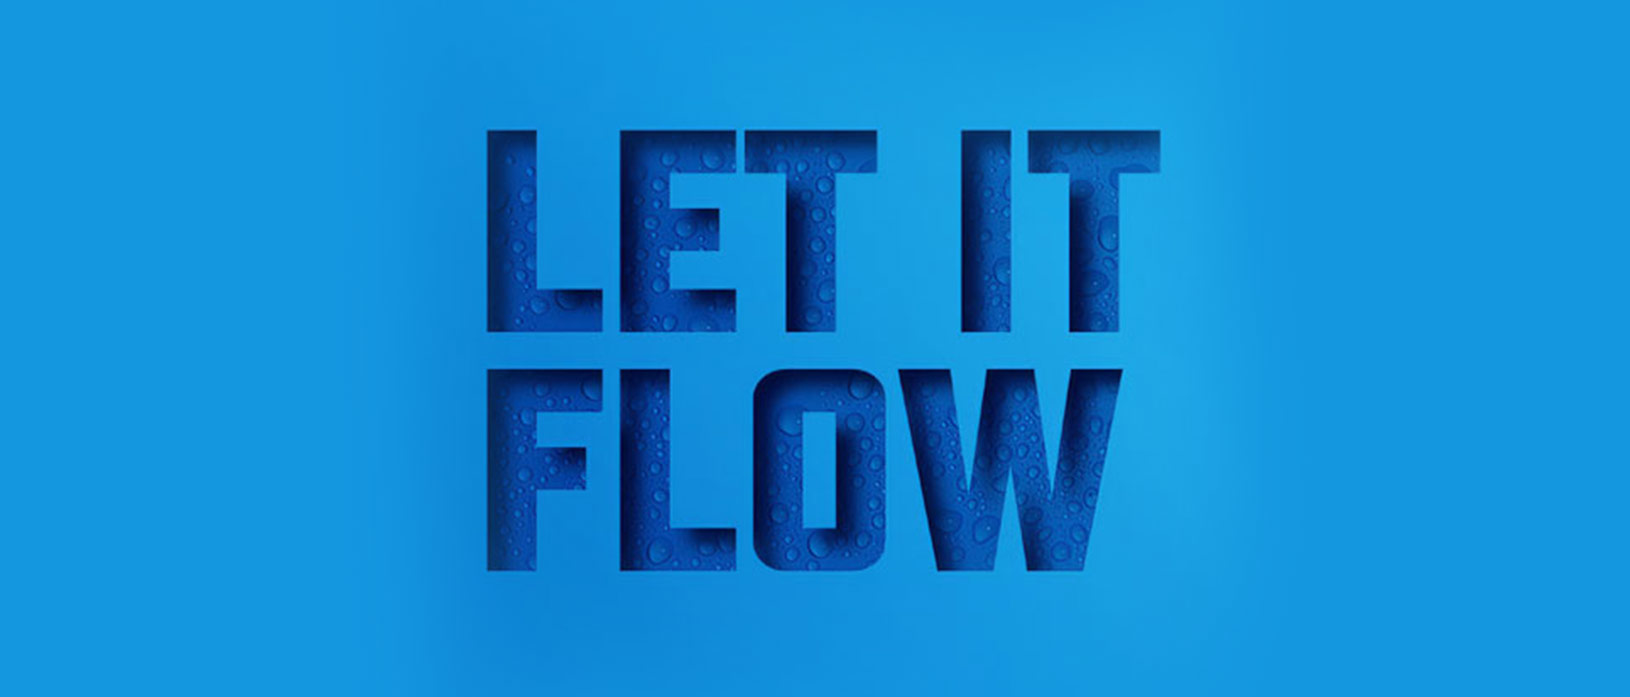 Let It Flow on blue background